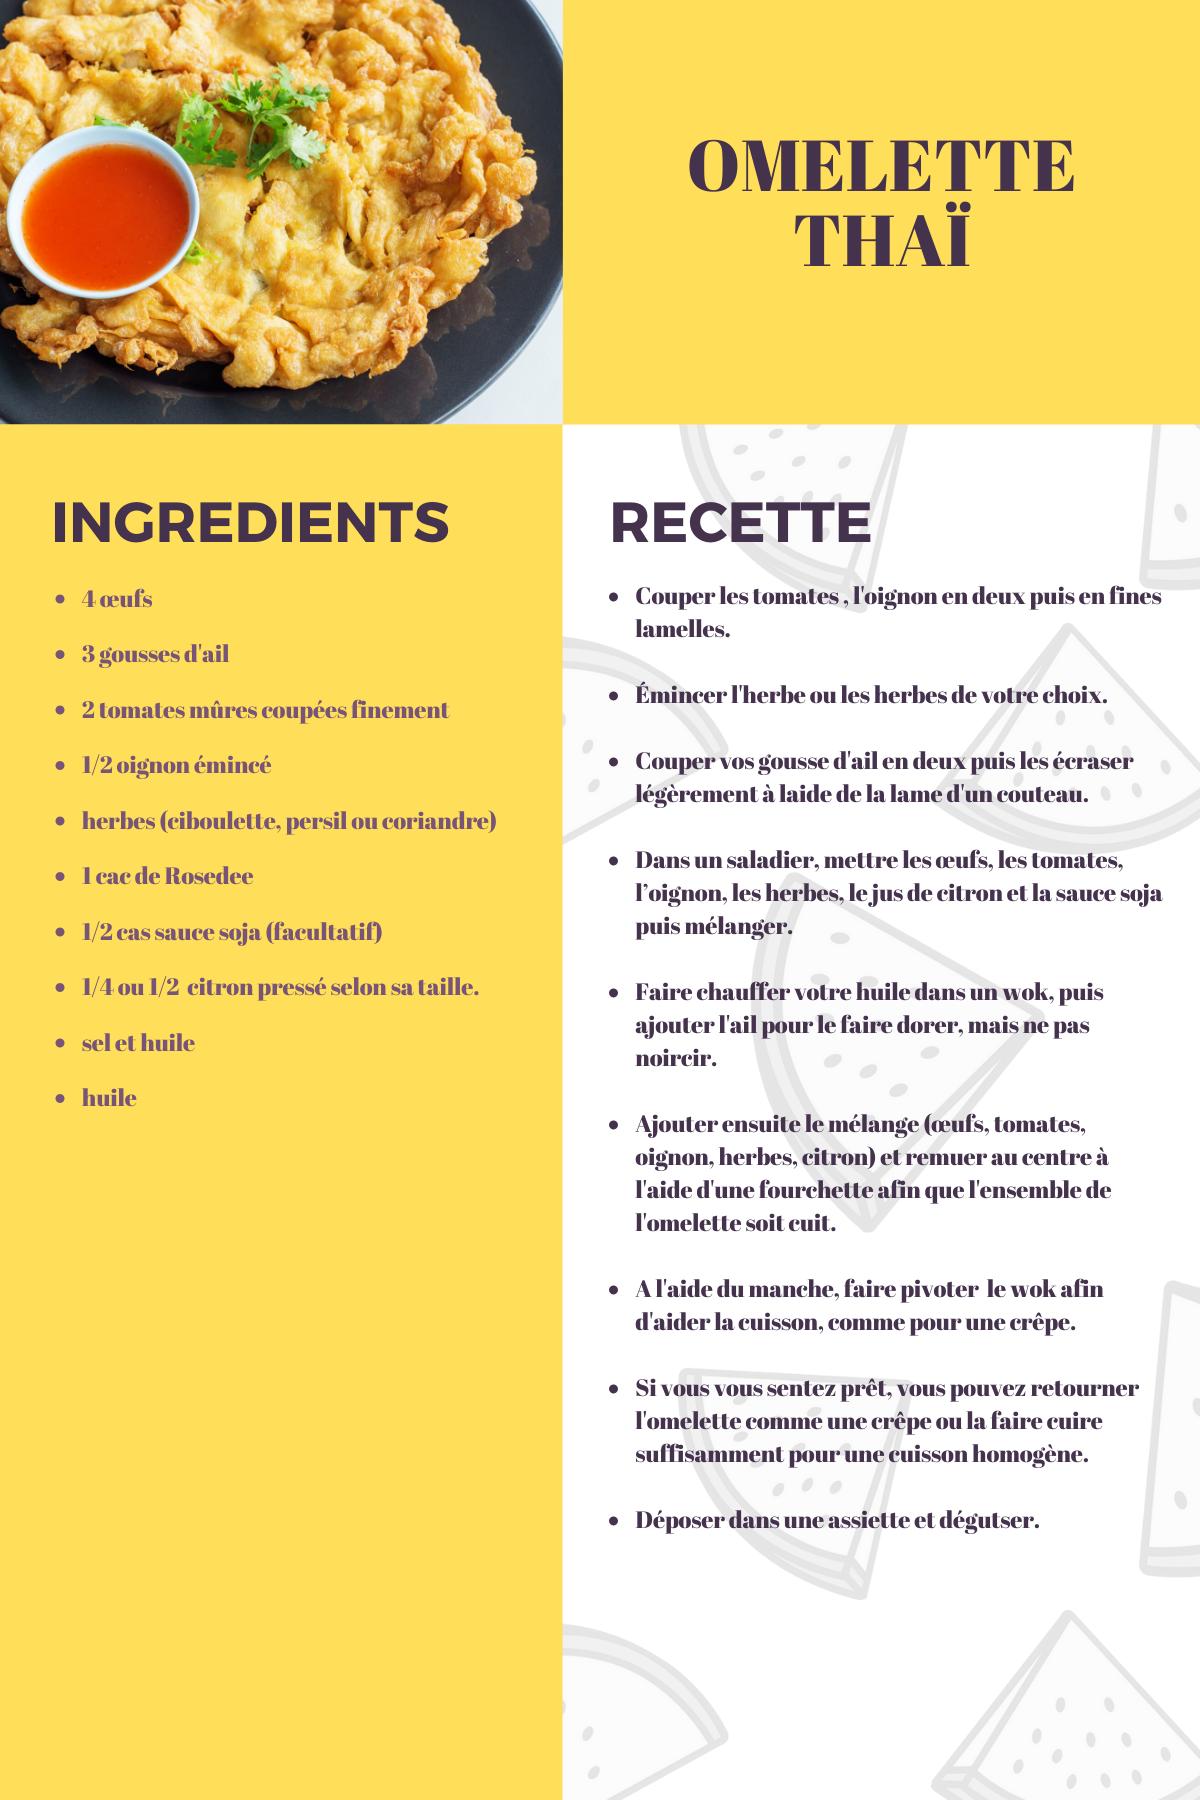 recette omelette thaï